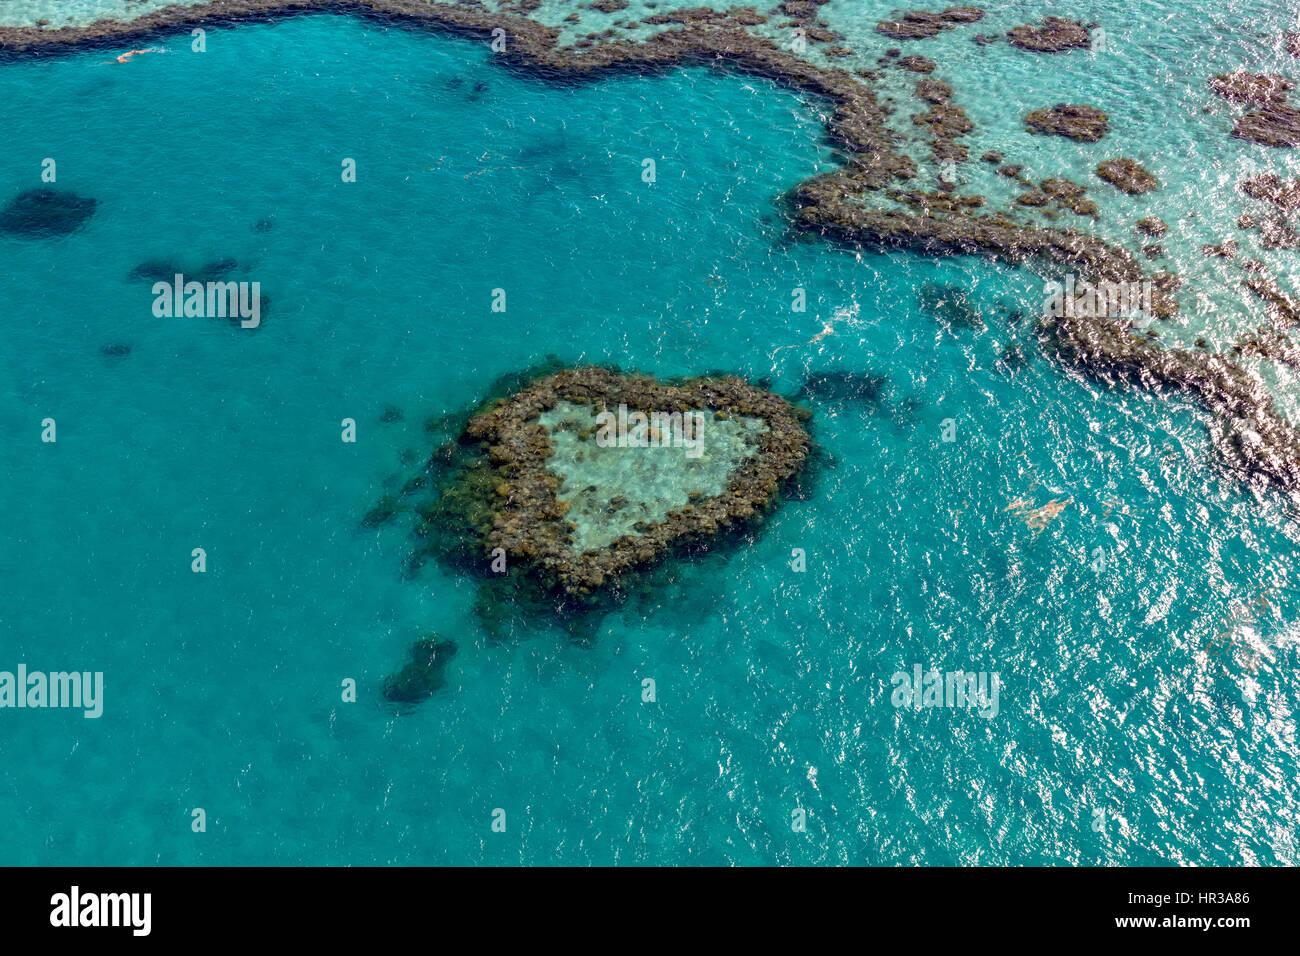 Korallenriff, Heart Reef, Teil von Hardy Reef, Outer Great Barrier Reef, Queensland, Australien Stockbild